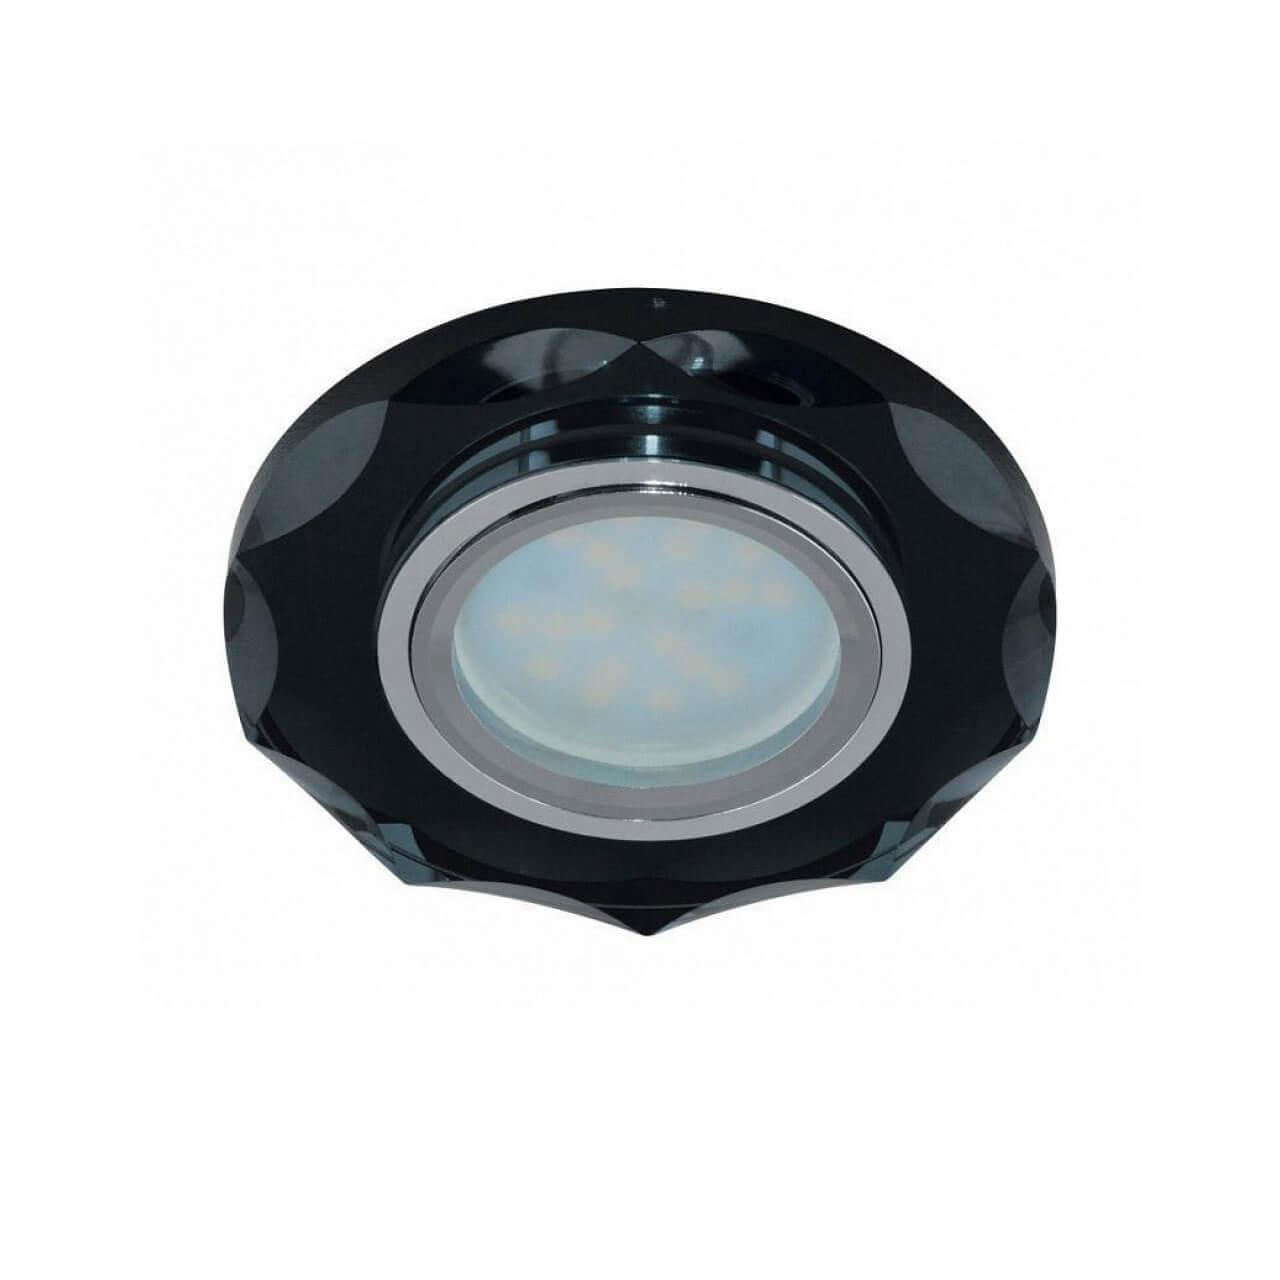 Светильник Fametto DLS-P105-2001 Peonia 105 светильник fametto dls l127 2001 luciole chrome glass